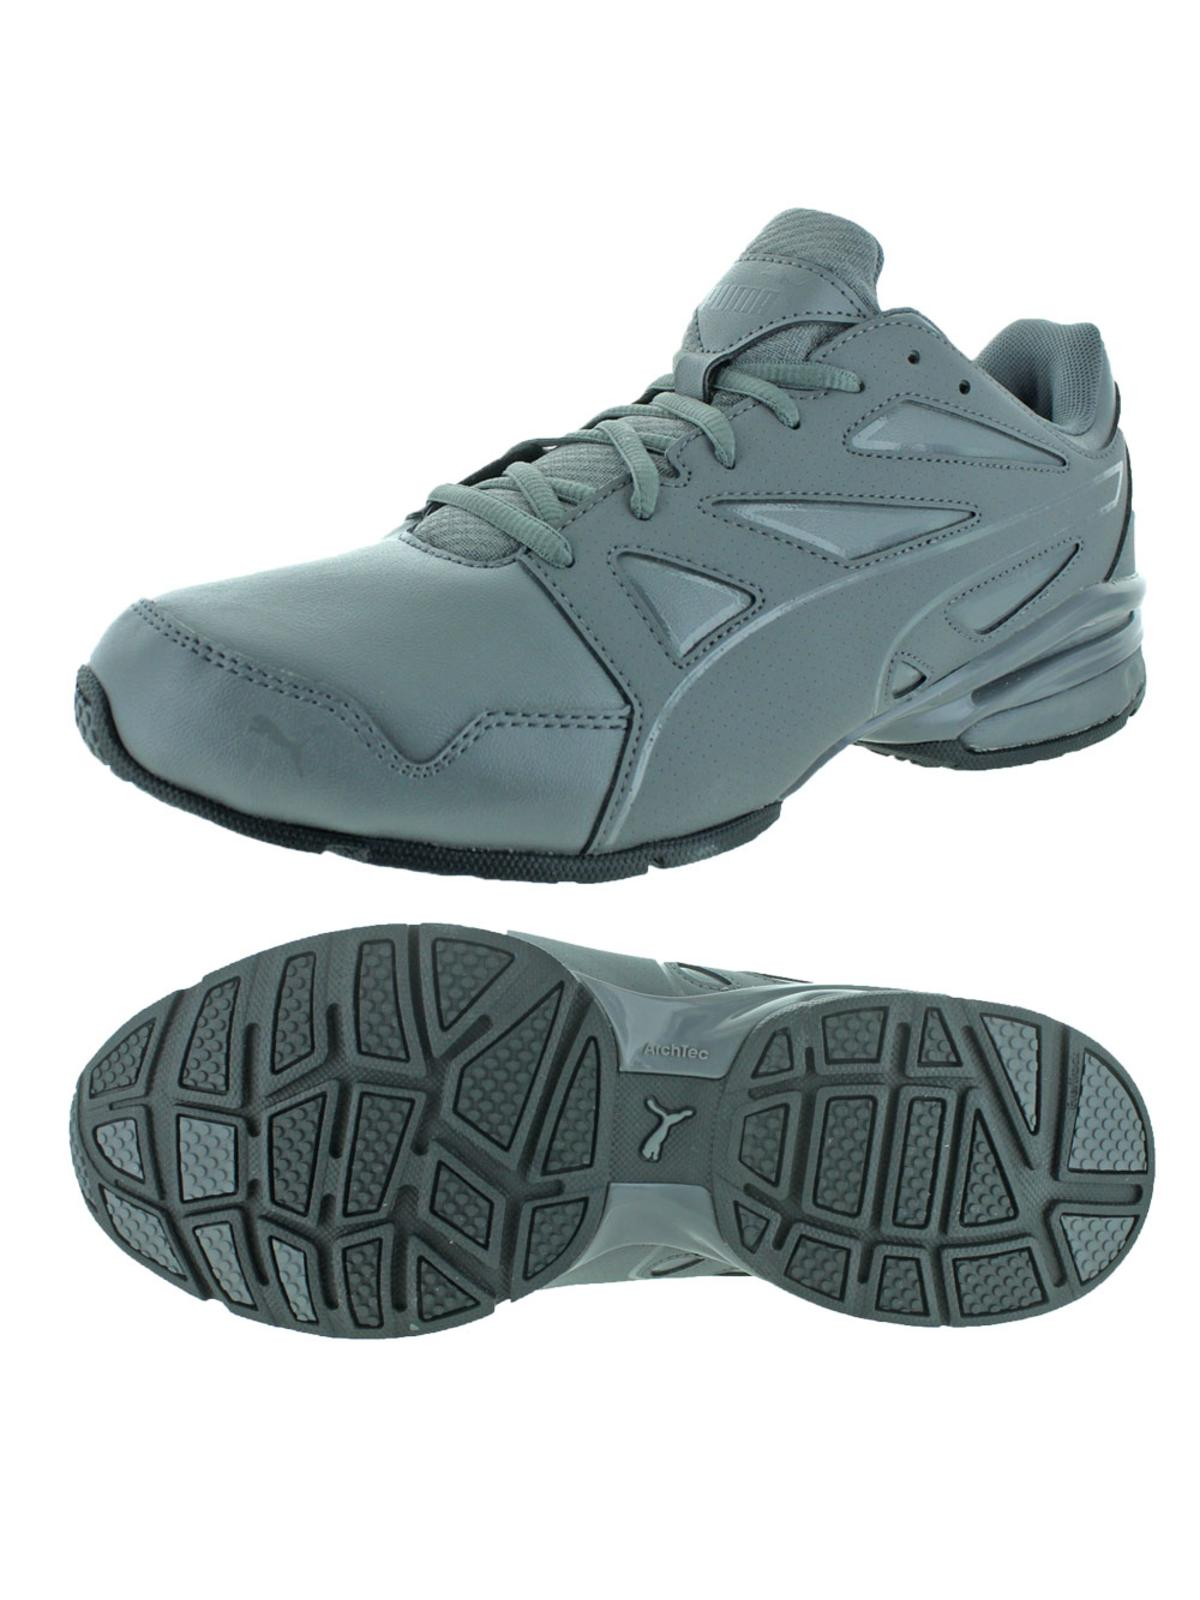 6b7f9914e67 PUMA - Puma Tazon Modern Fracture Men s Running Sneakers Shoes - Walmart.com